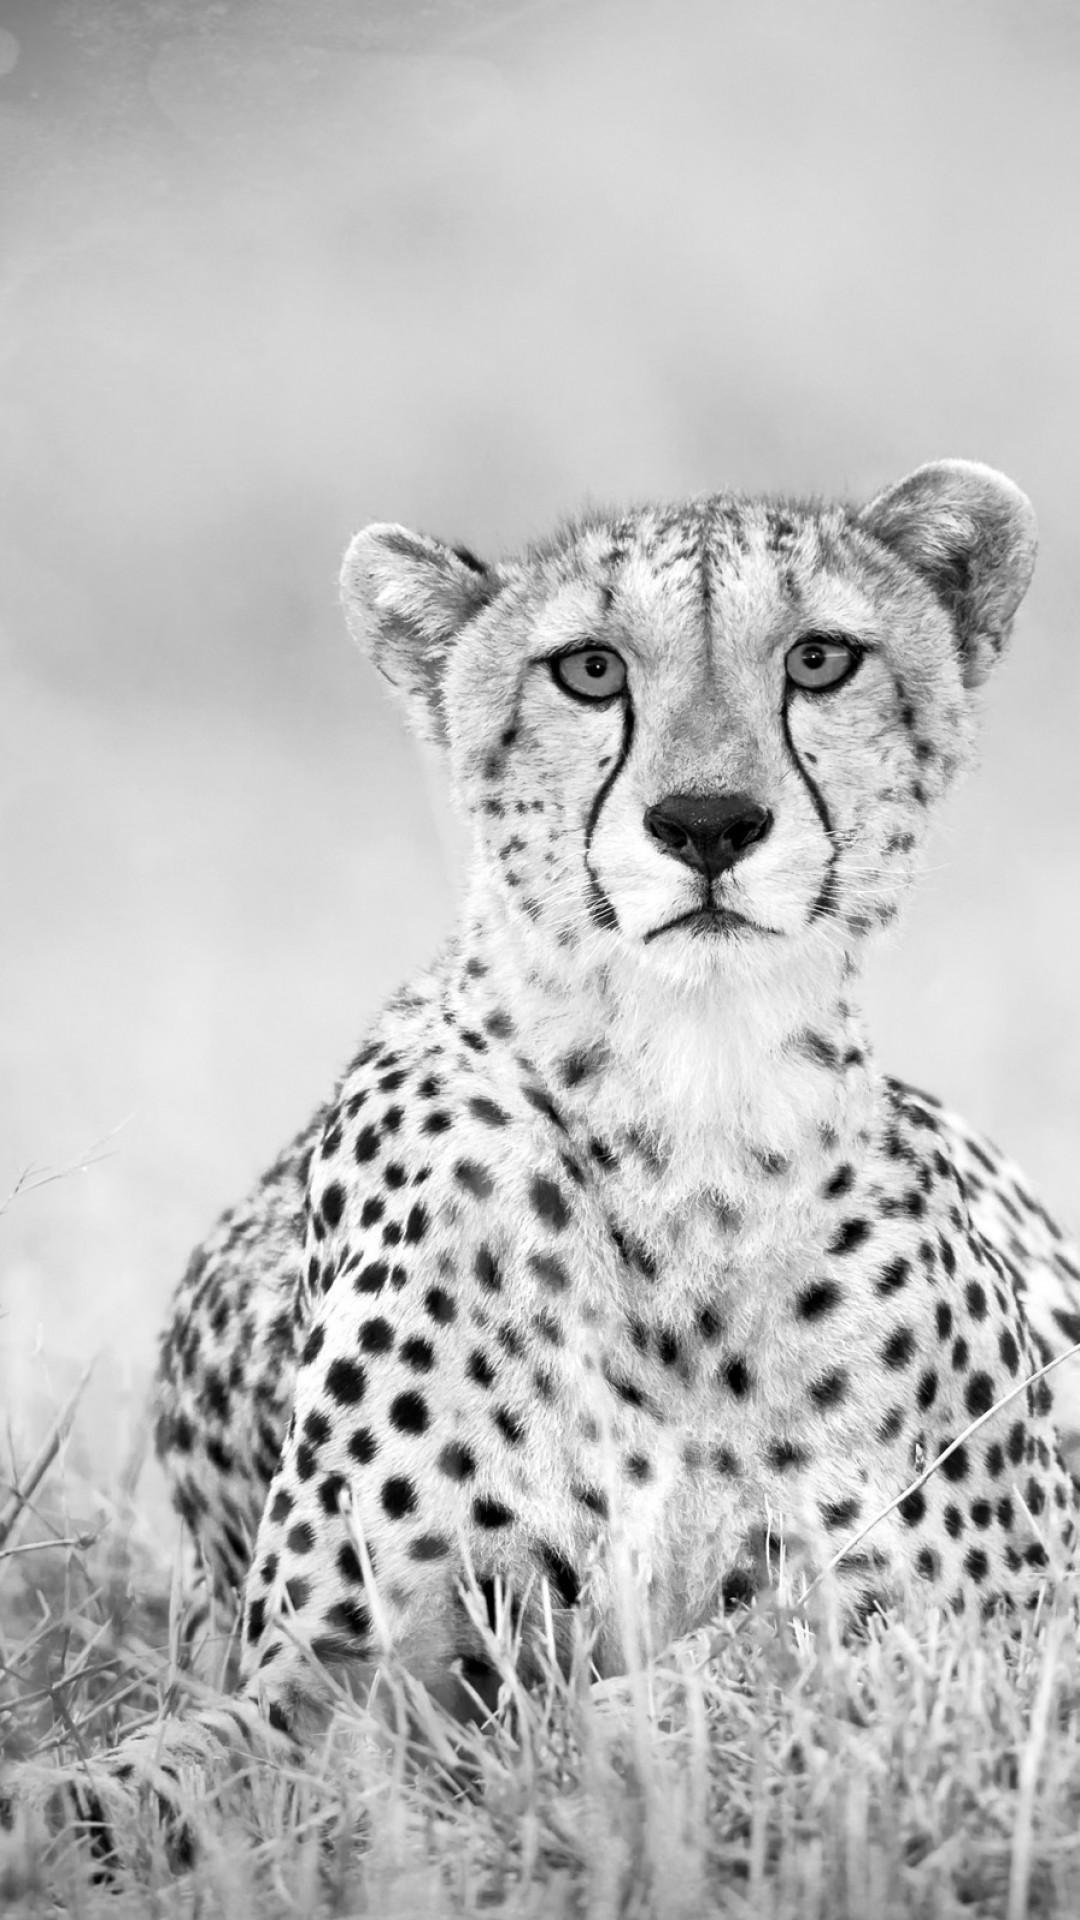 Cheetah Print Wallpaper Hd Black Cheetah Wallpaper 183 ① Wallpapertag